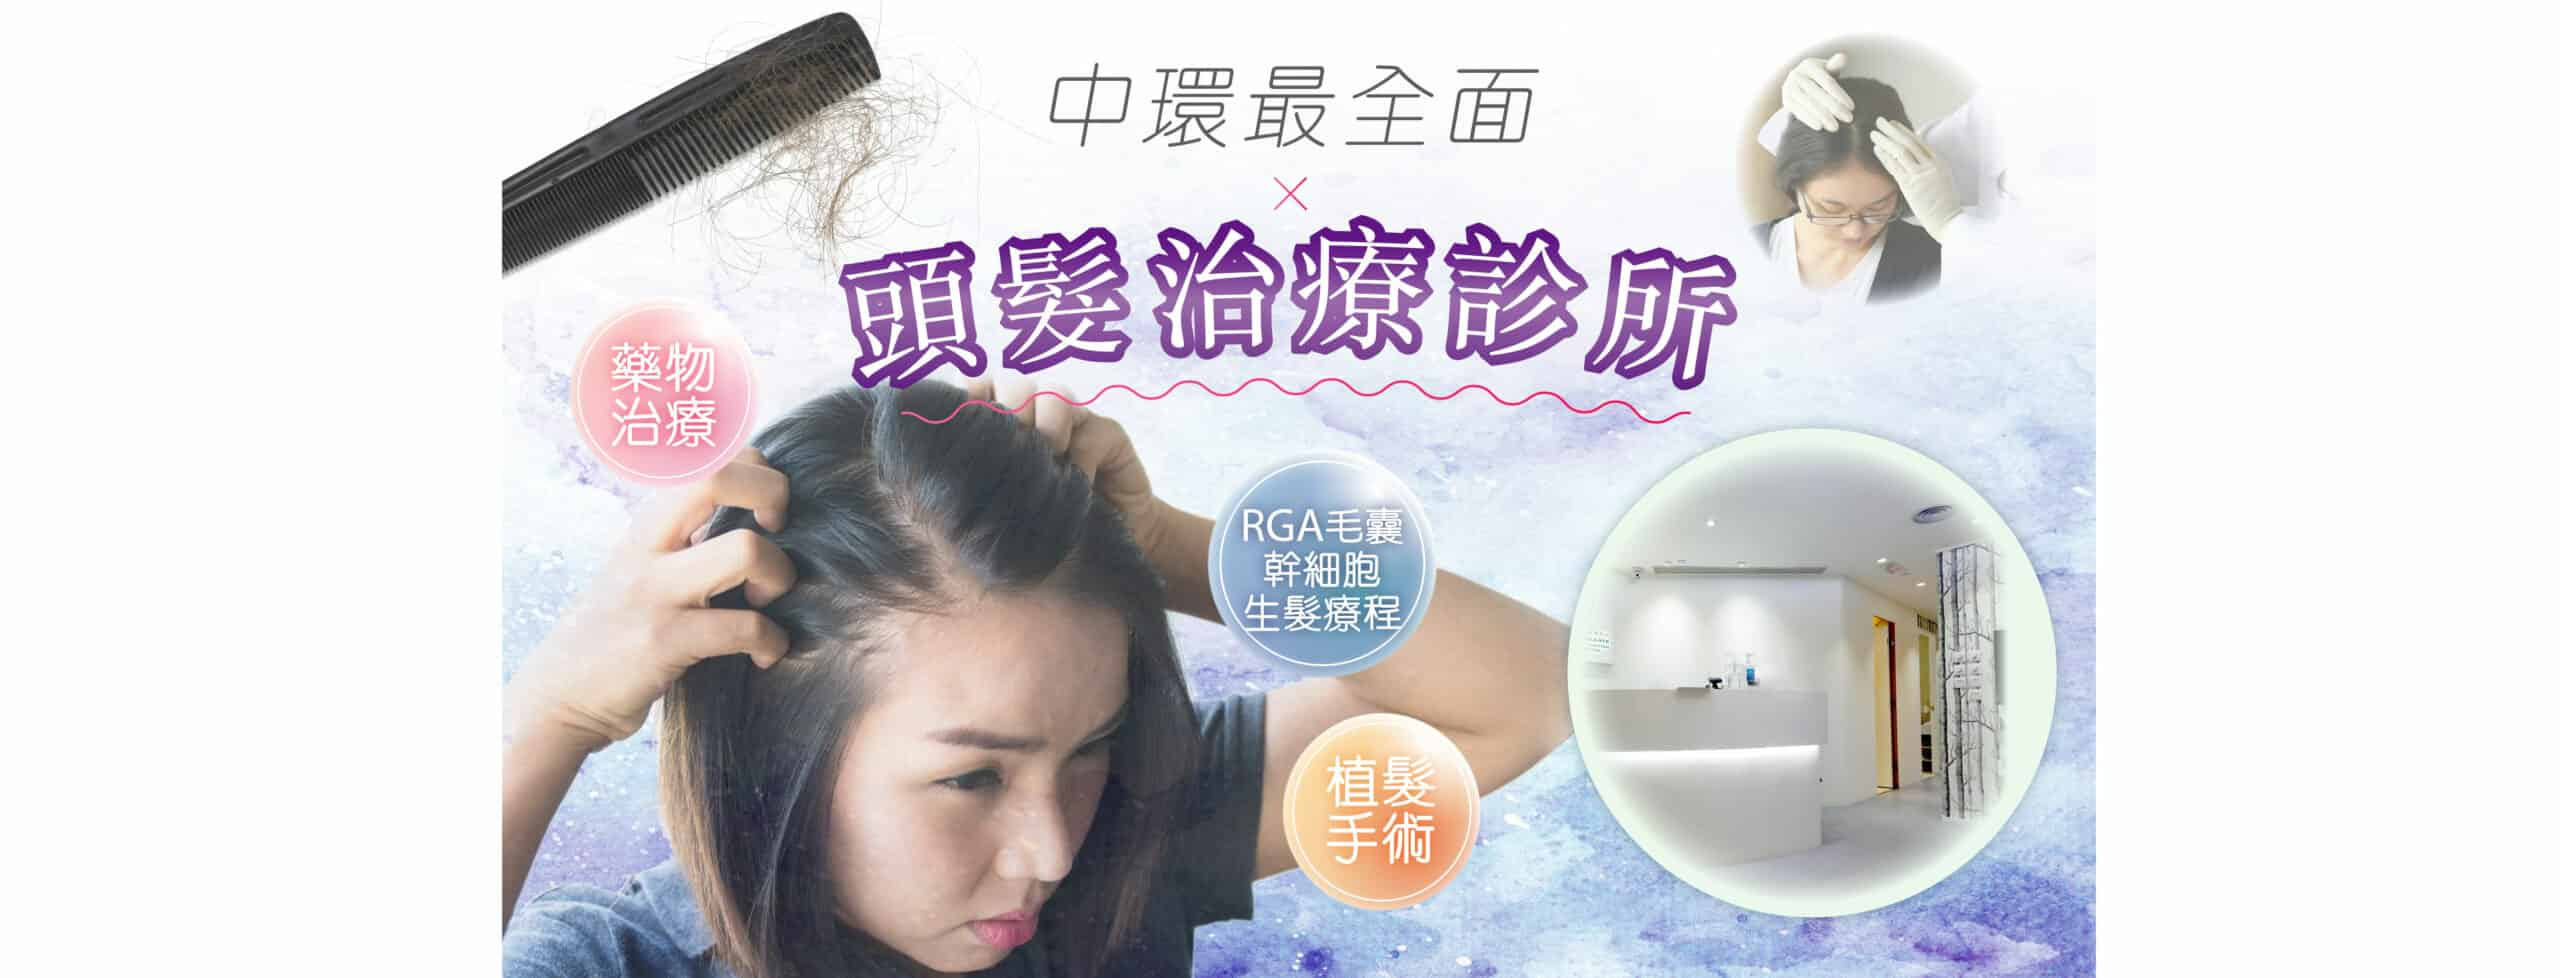 Hair_Clinic 中環頭髮診所 工作區域 1 scaled